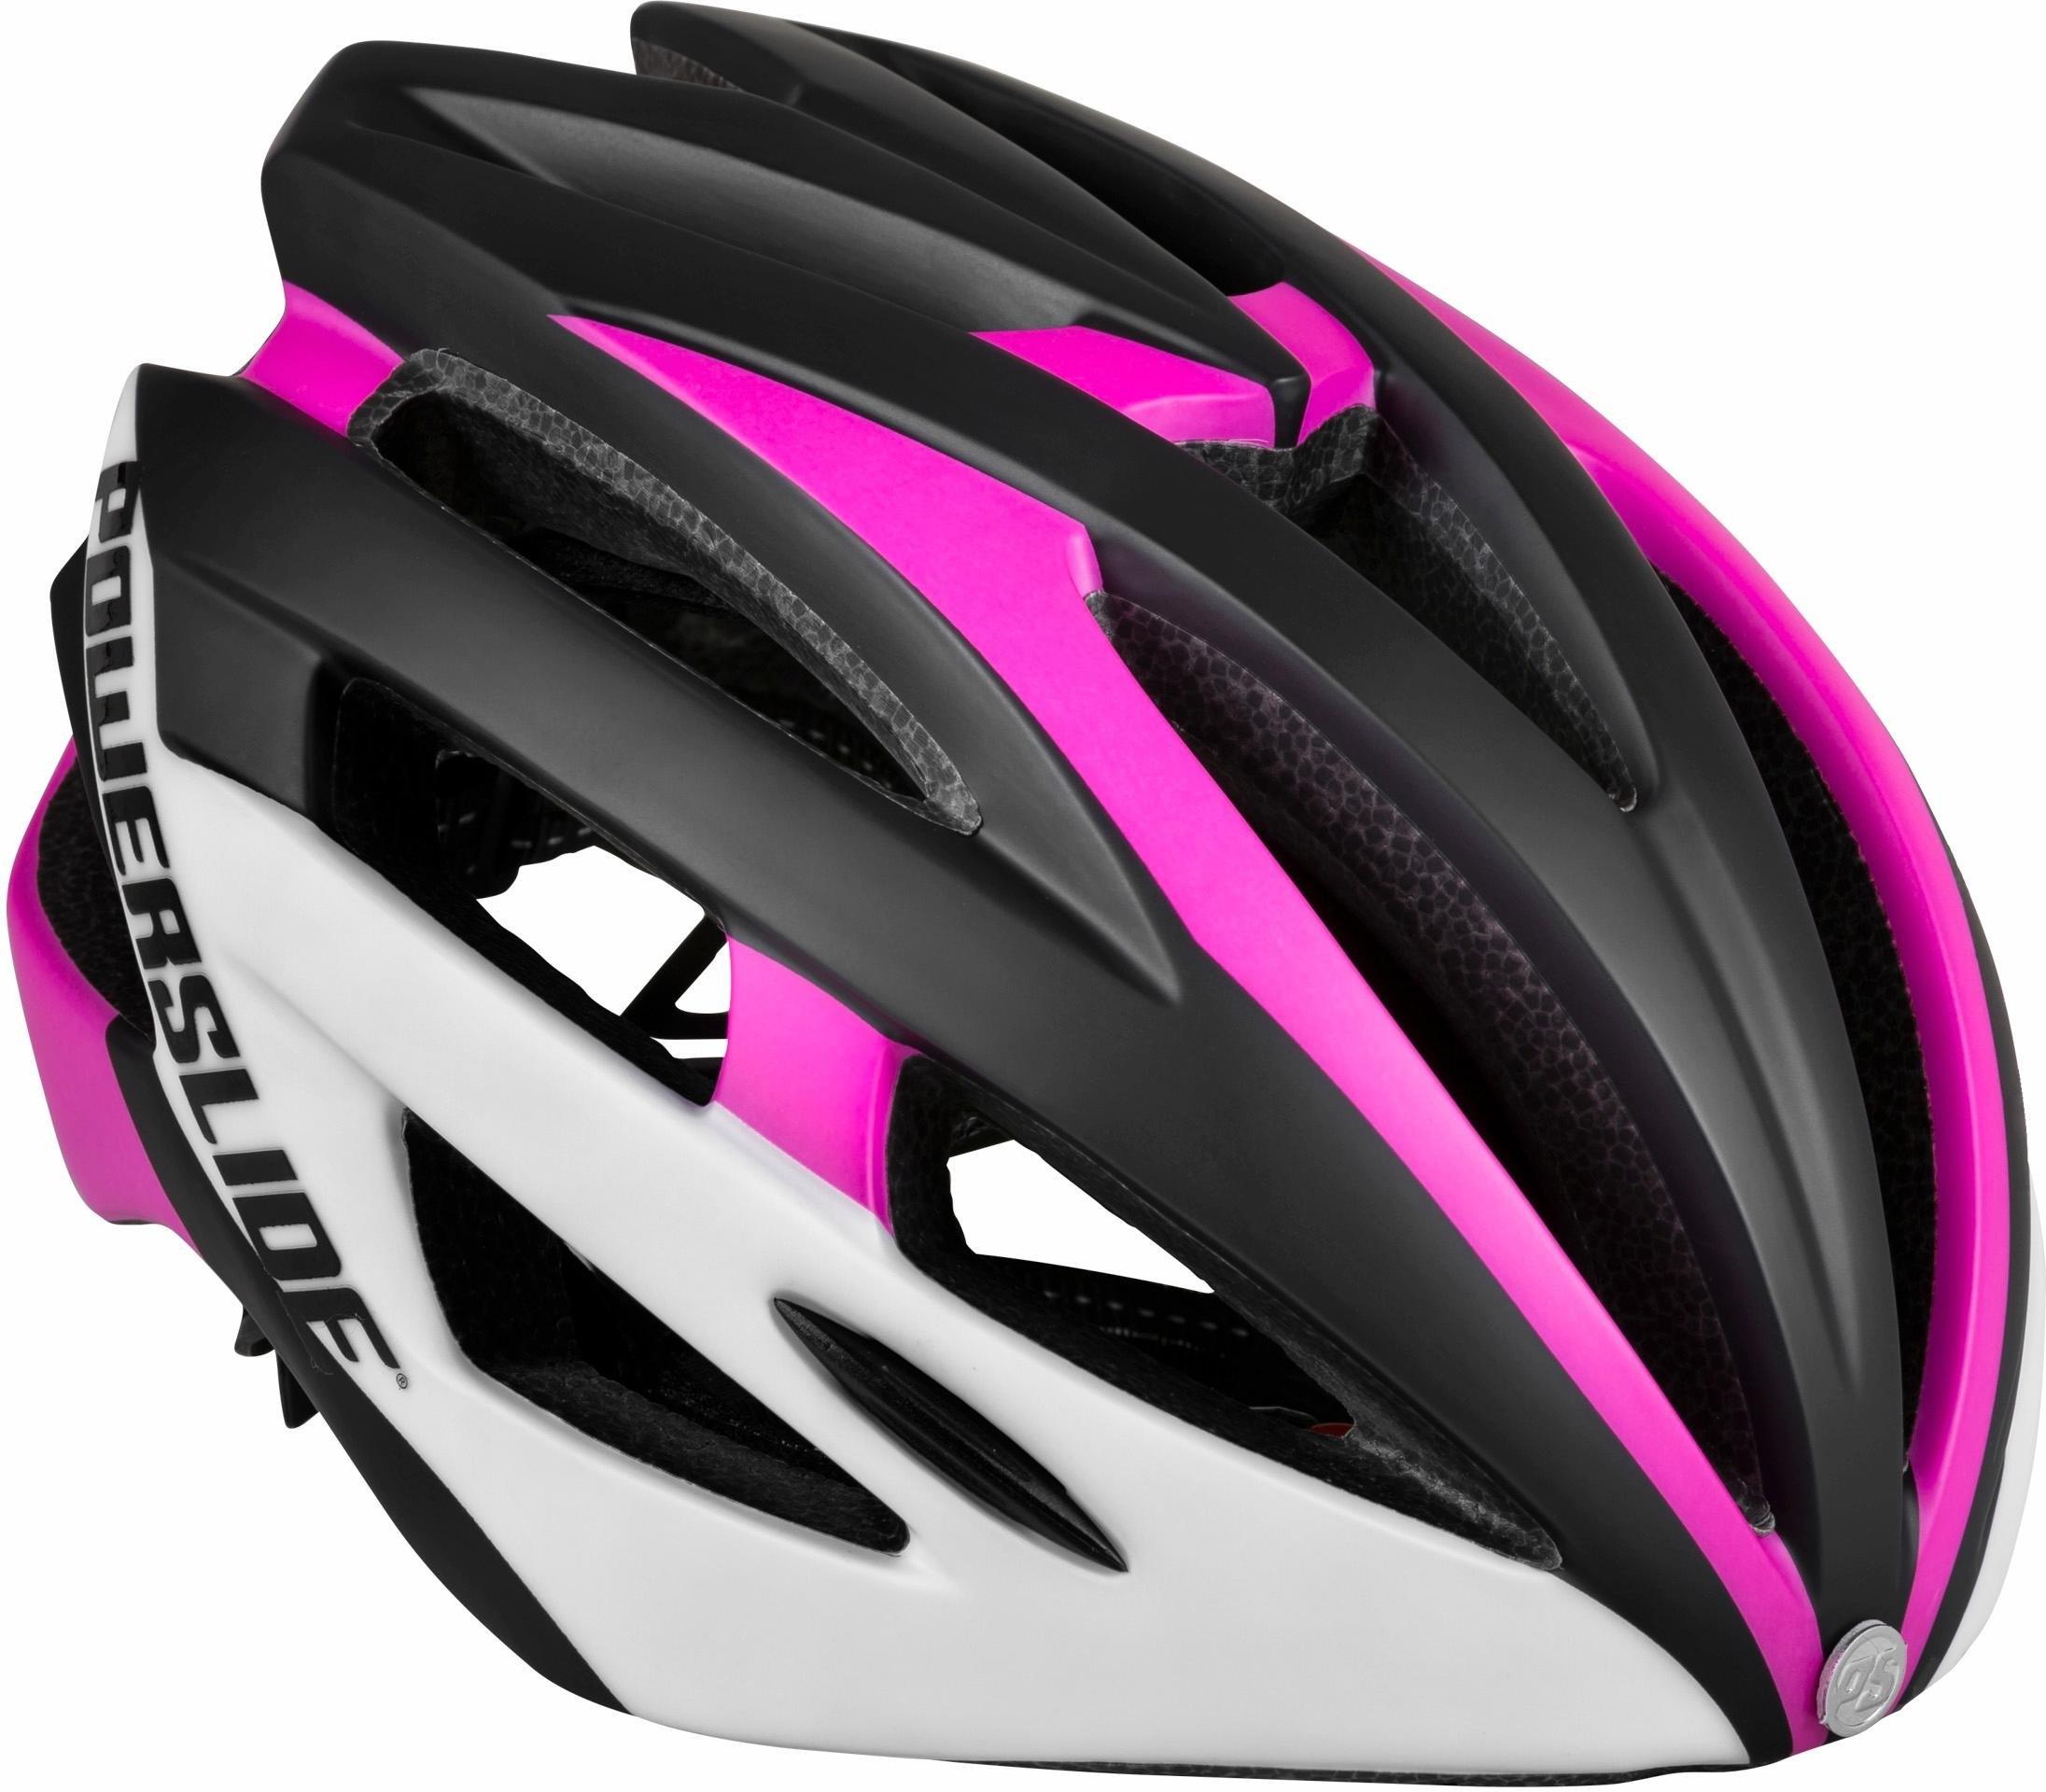 Powerslide helm, kinderen, »Race Attack White / Pink« - verschillende betaalmethodes